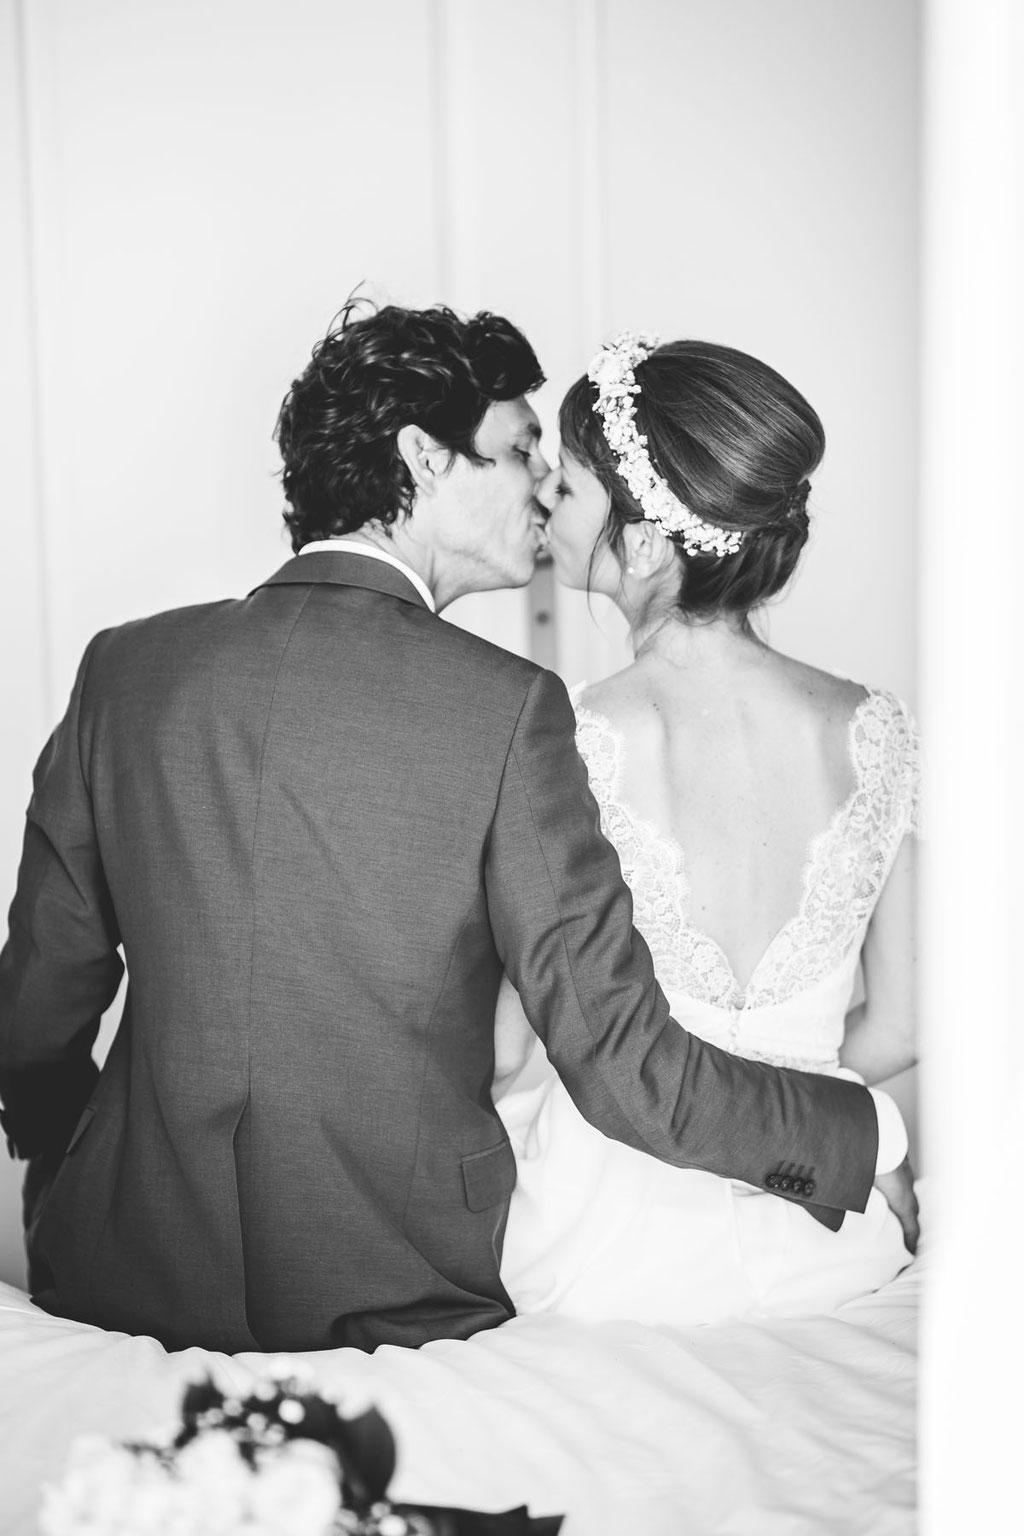 Photographe pornic mariage nantes plage de monsieur hulot orlane-photos.com